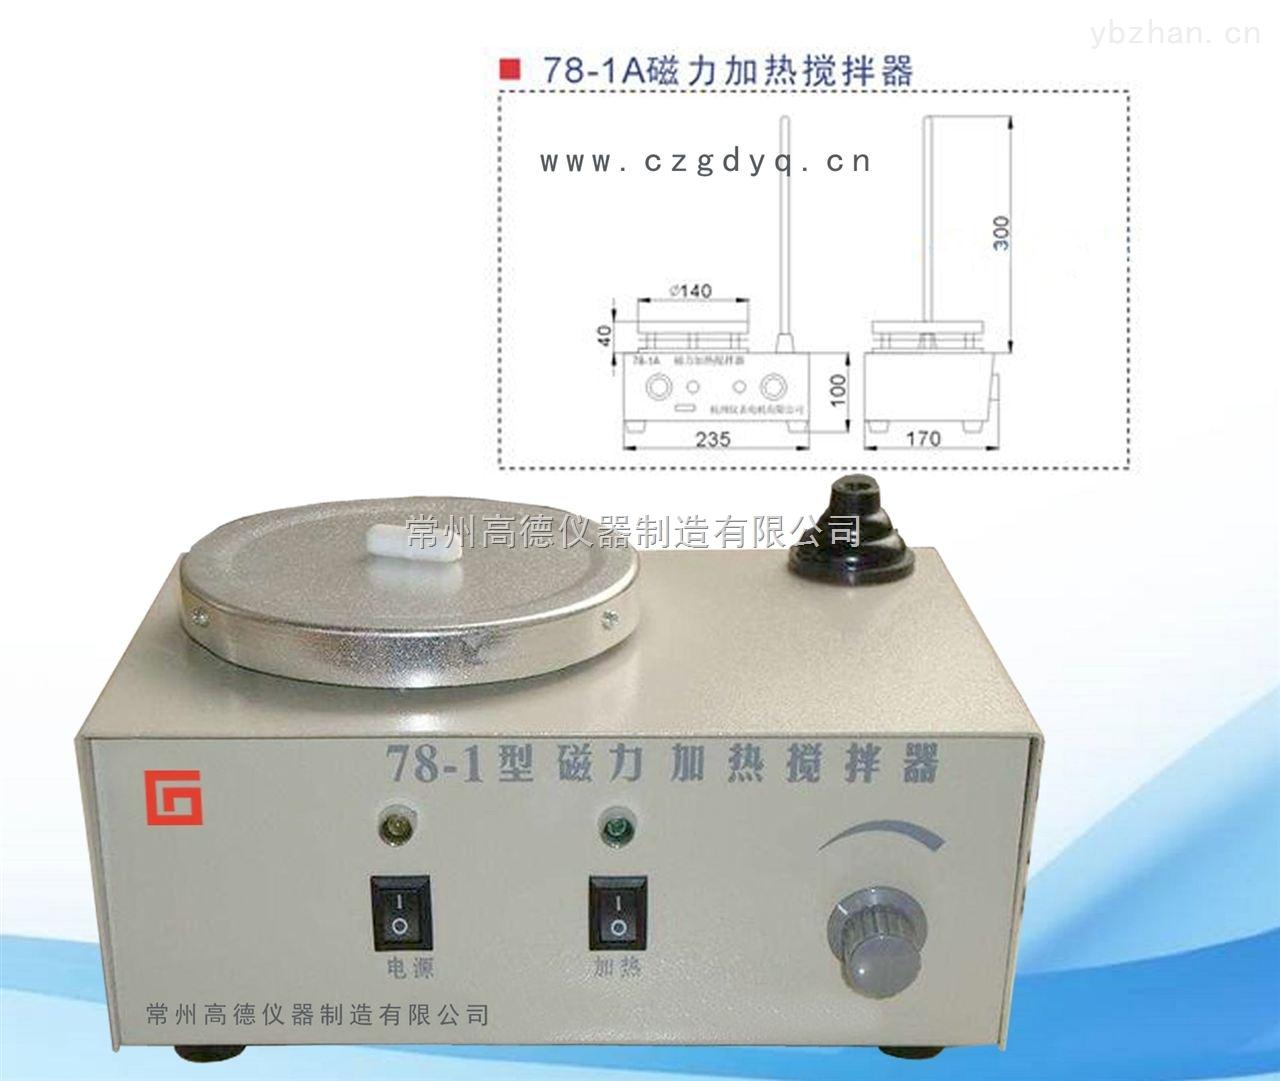 78-1A-磁力加熱攪拌器